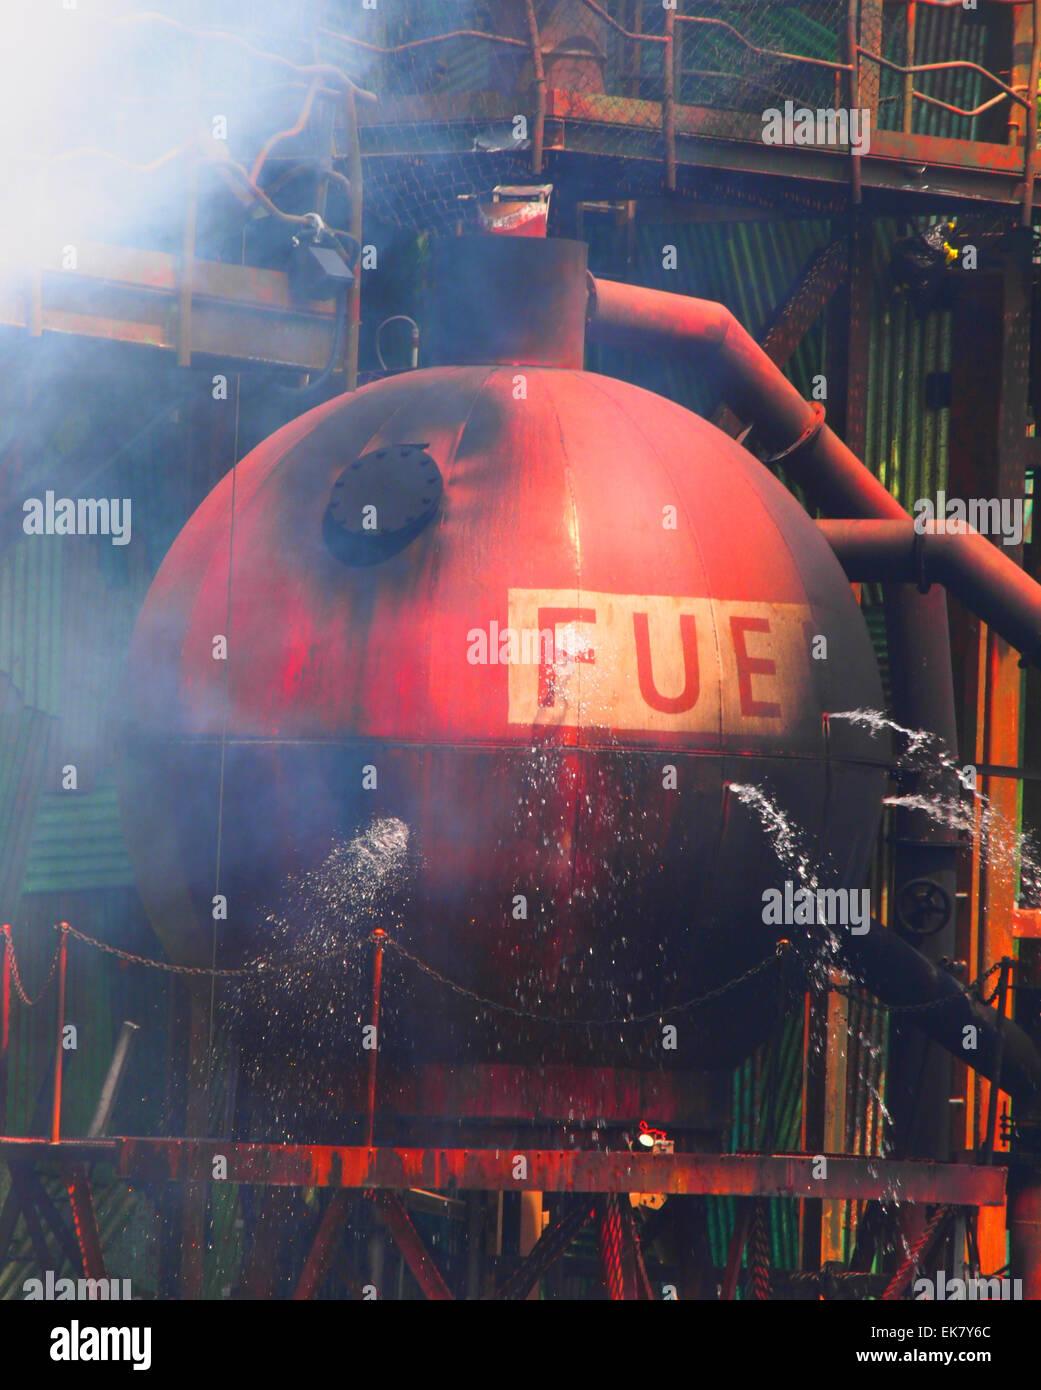 fuel tank - Stock Image